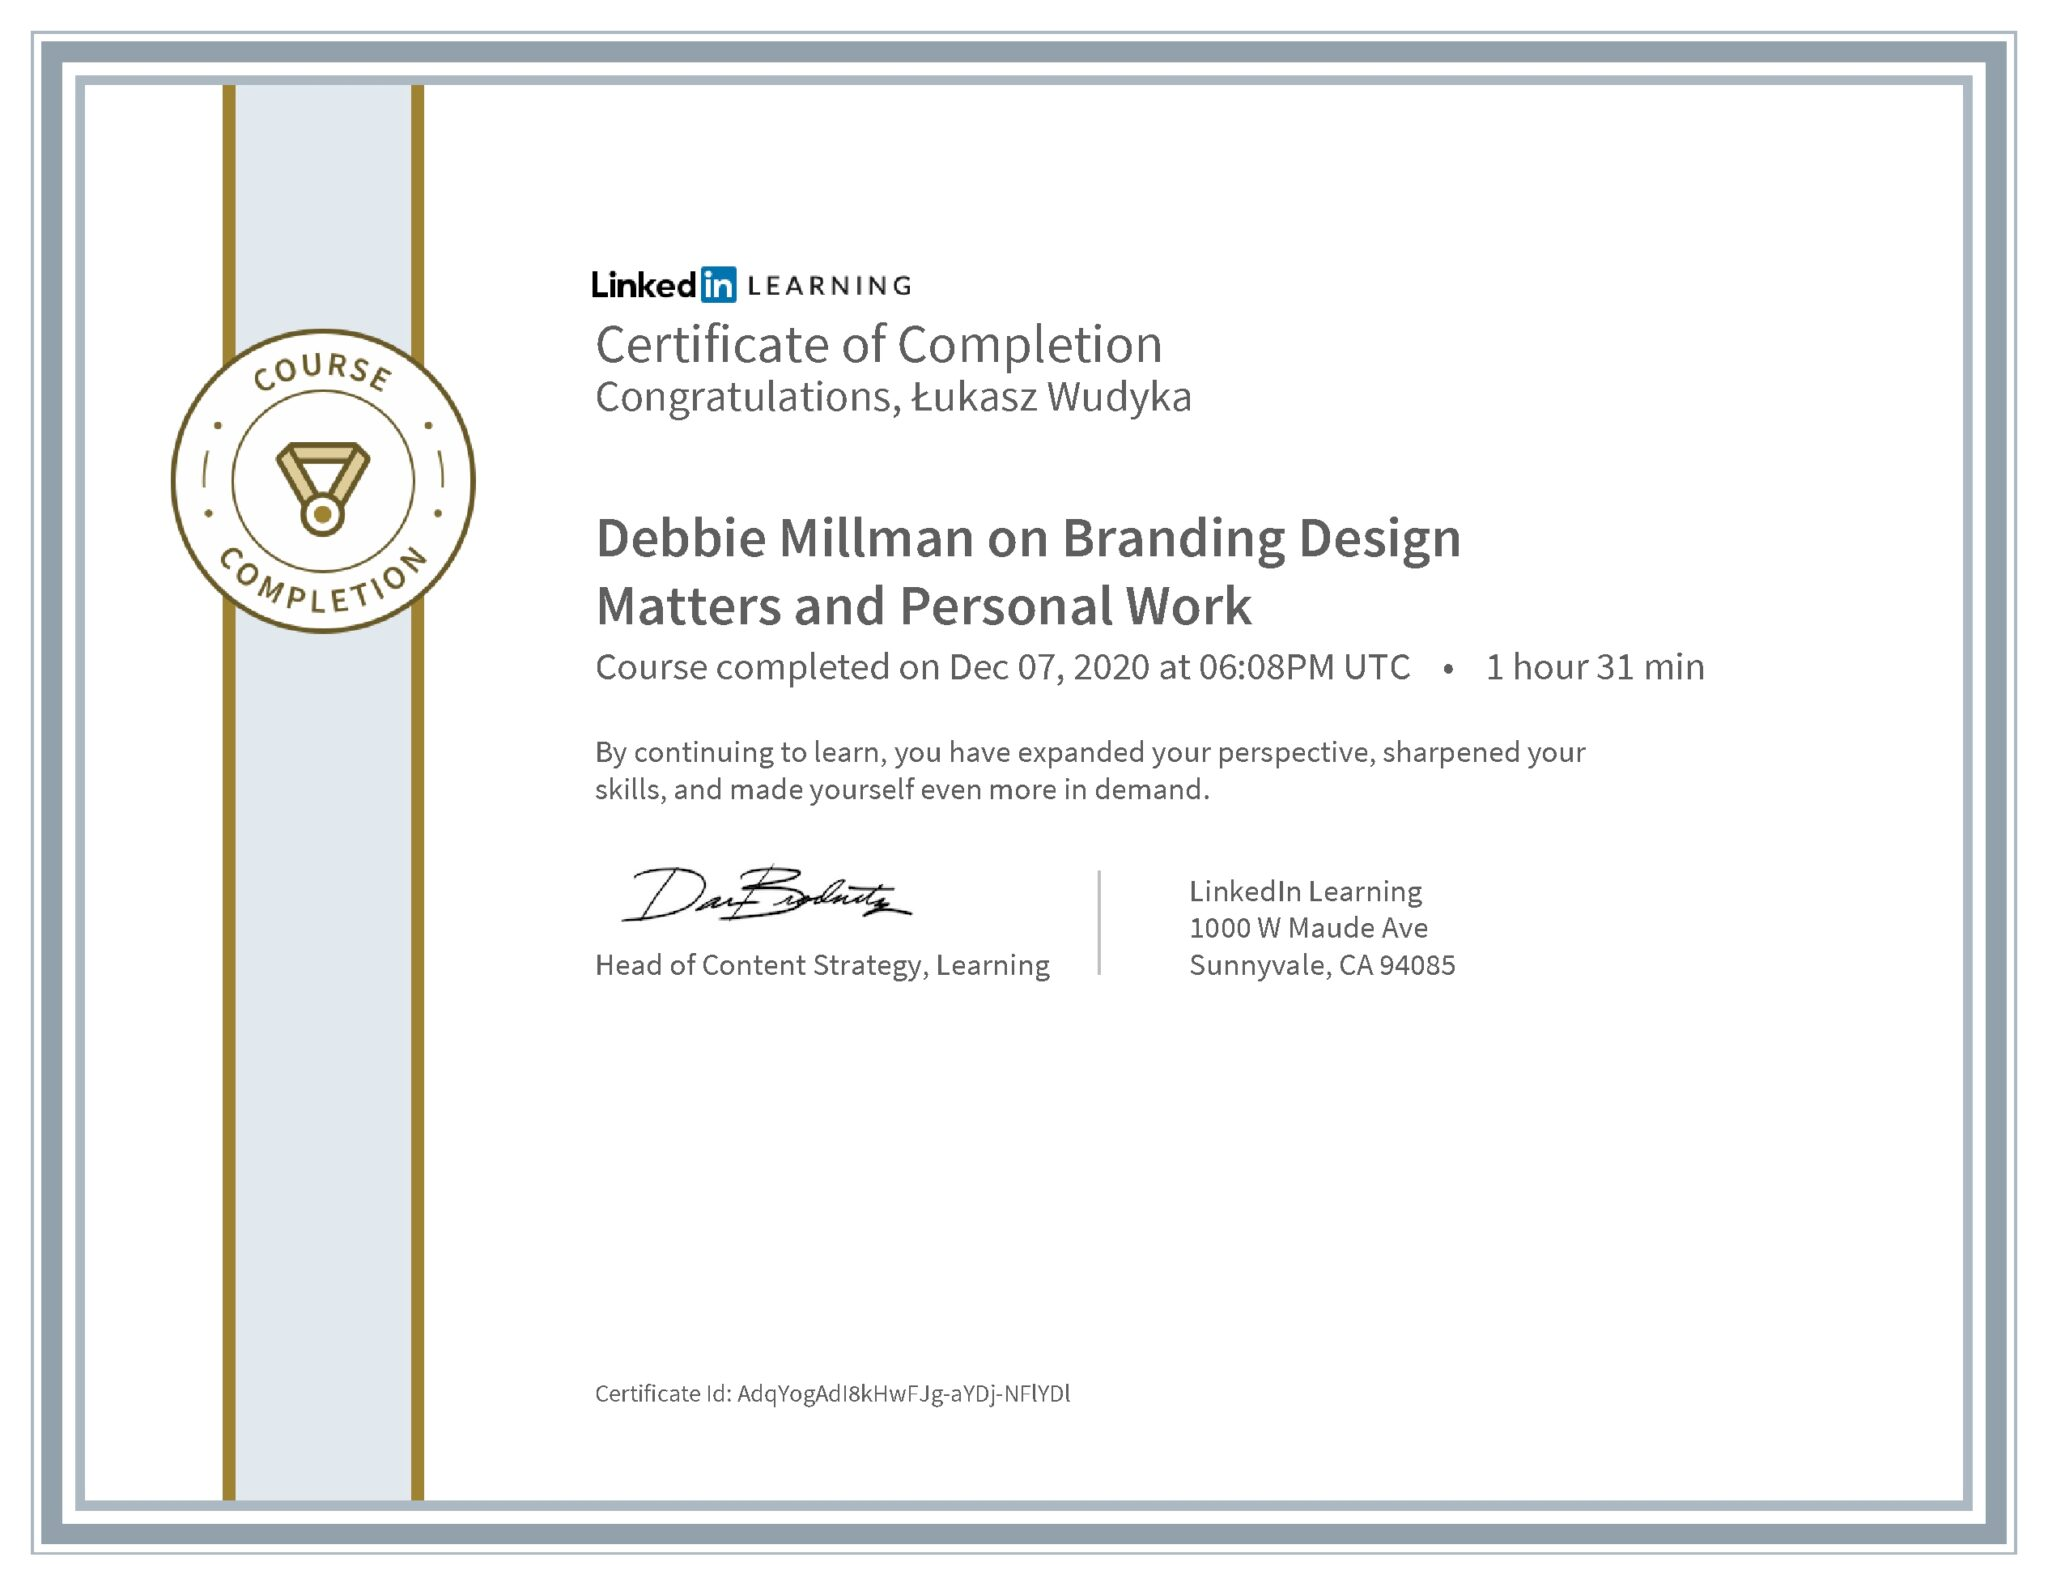 Łukasz Wudyka certyfikat LinkedIn Debbie Millman on Branding Design Matters and Personal Work